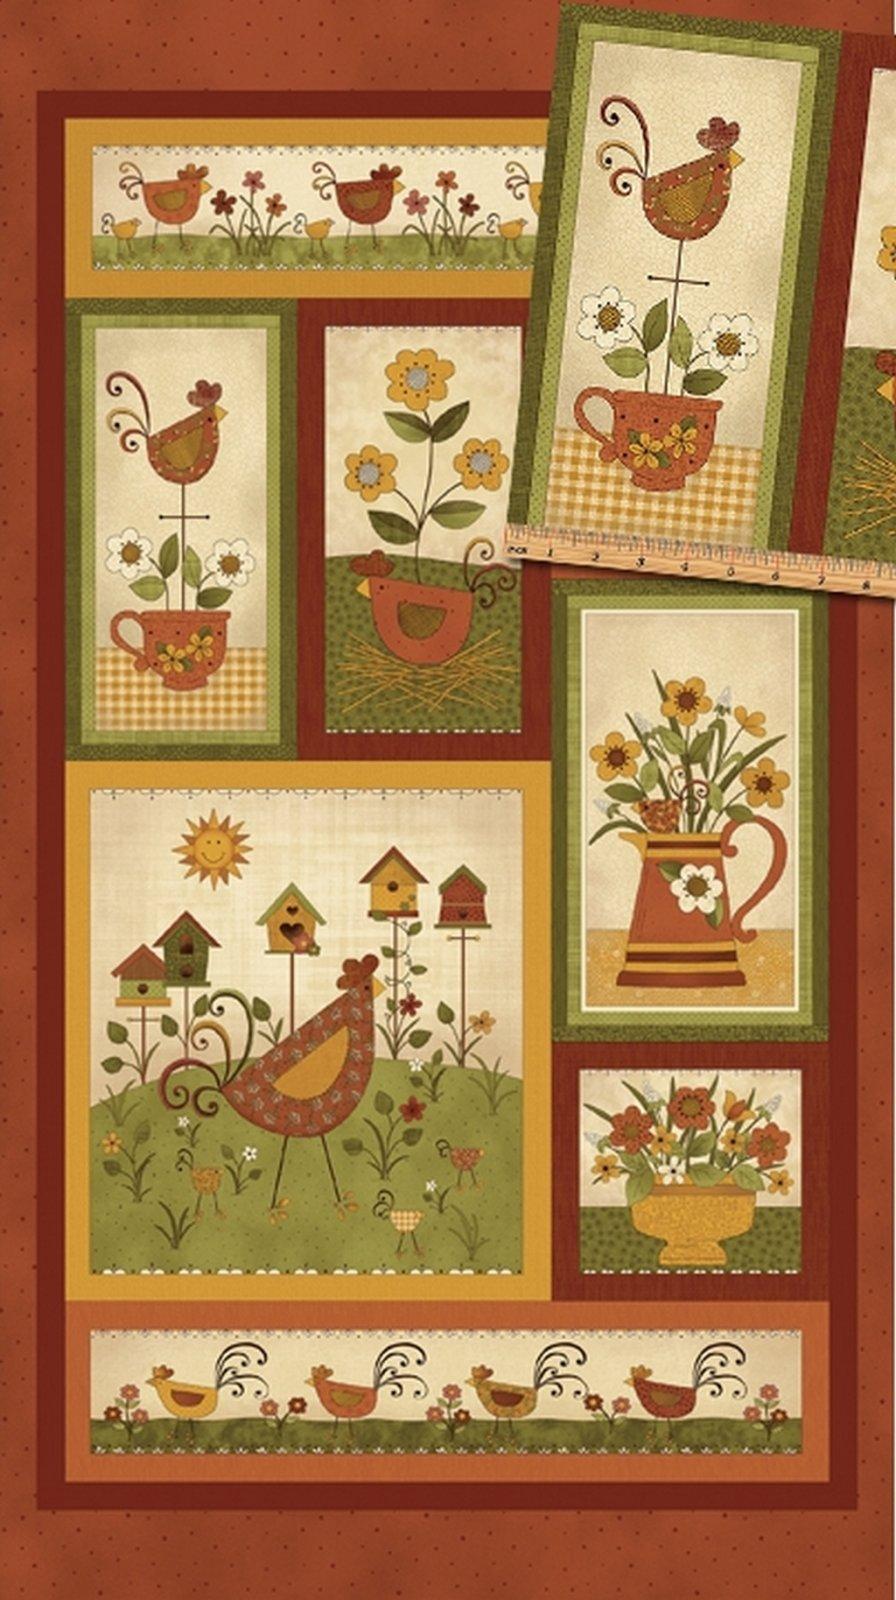 Chicks on the Run - Panel (24 x 44) - Spice